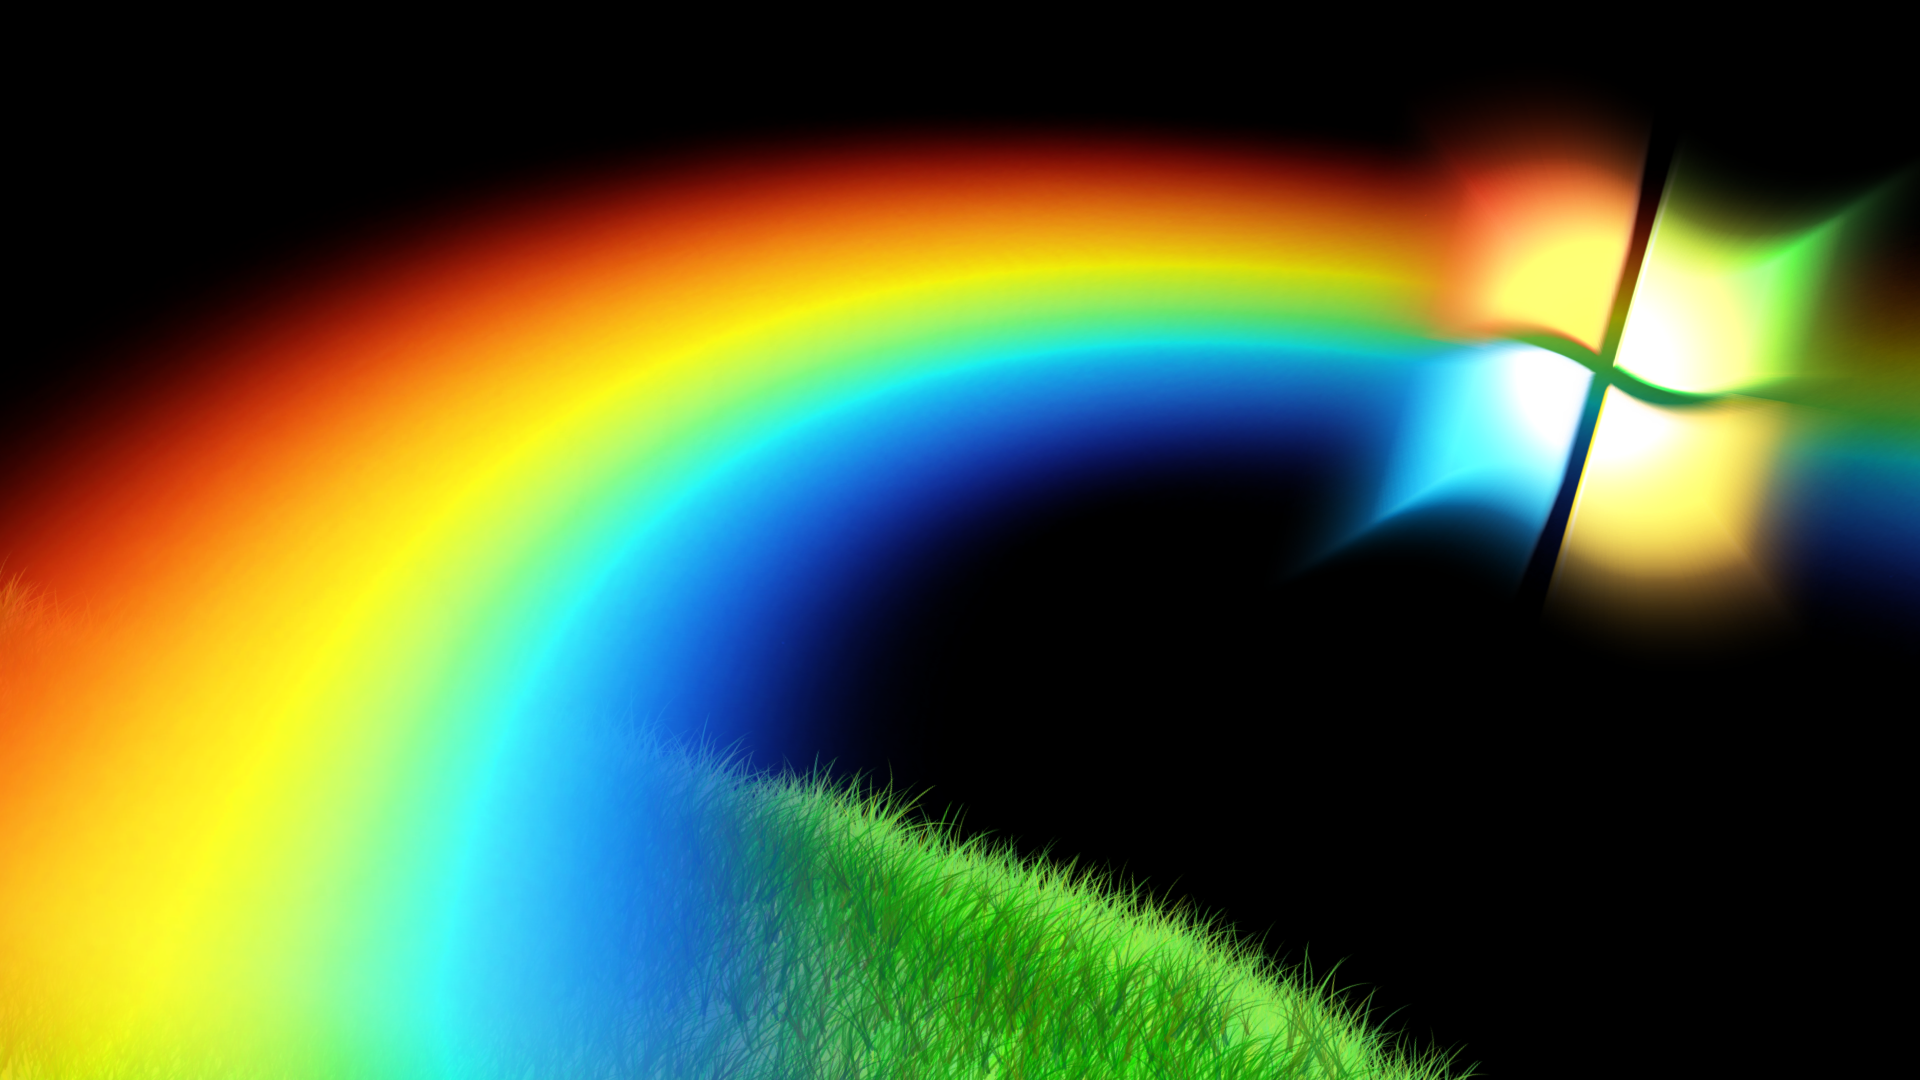 Hd Wallpapers Pulse: HD Rainbow Wallpaper